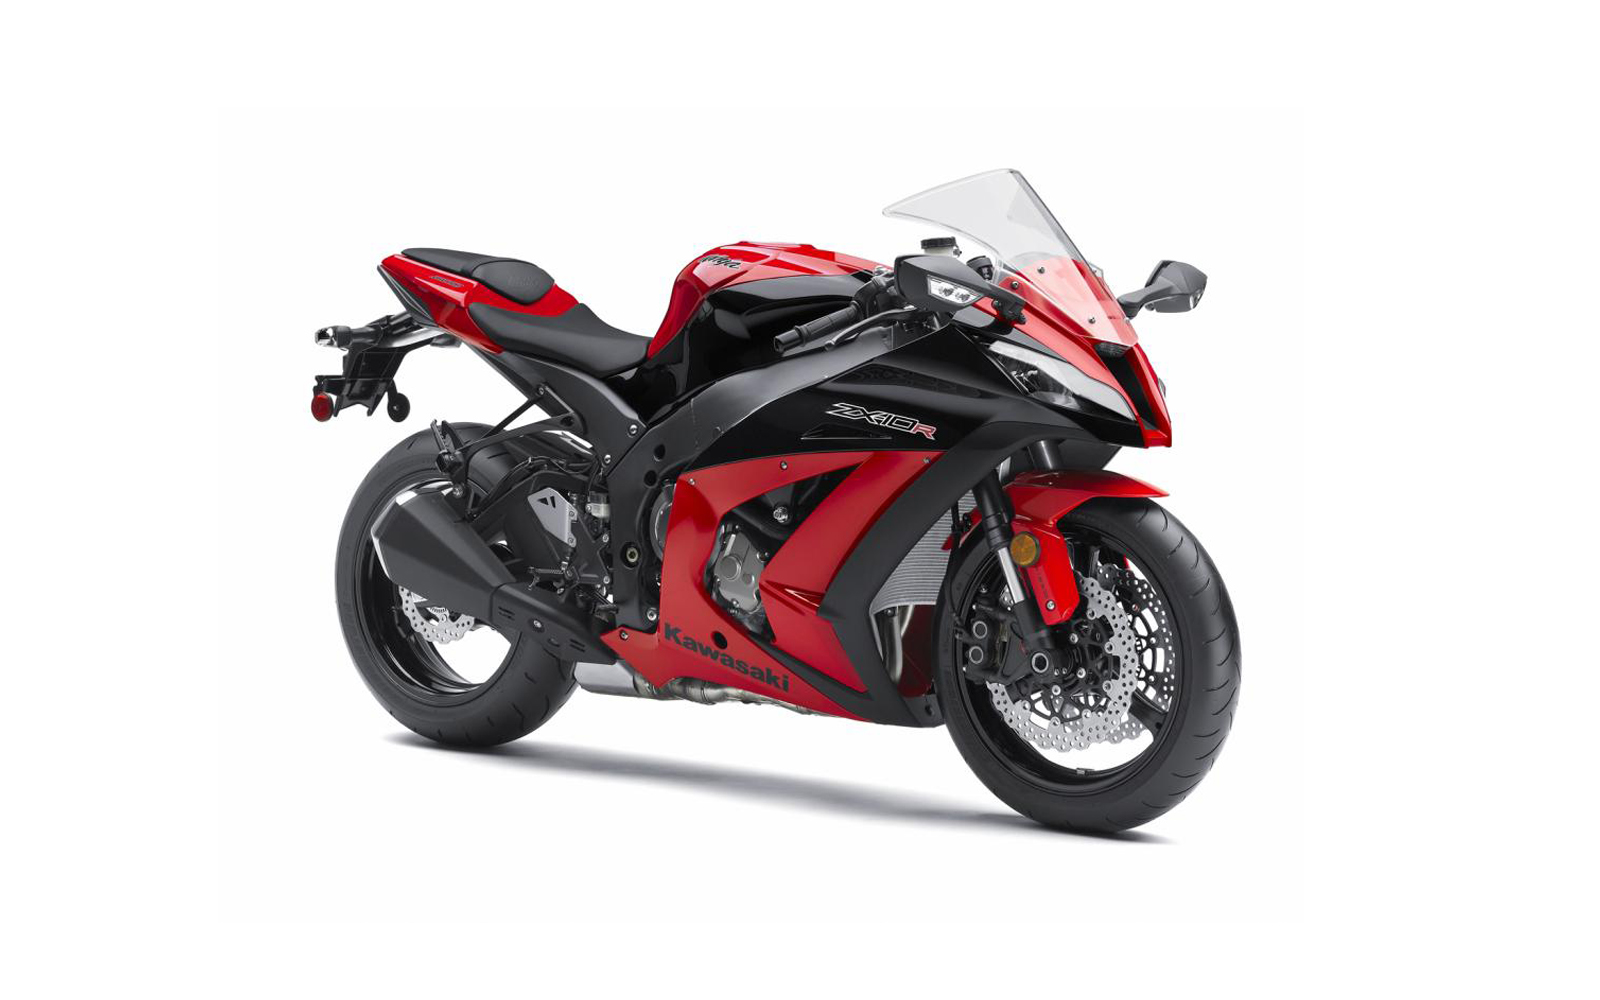 Kawasaki - мотоциклы Кавасаки 2017: характеристики, цены ...